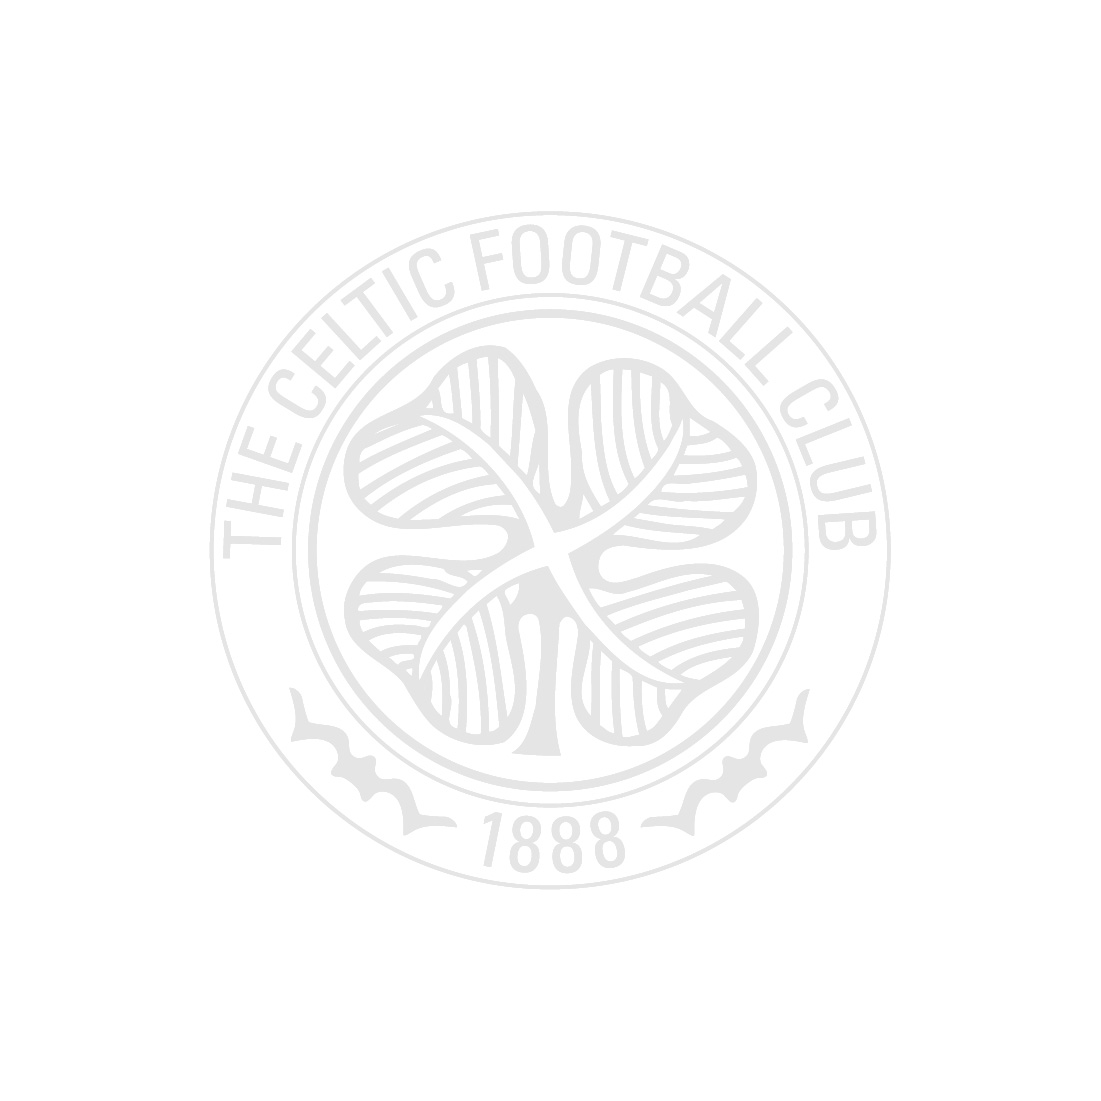 Celtic Essentials Crest Tape Pocket T-shirt